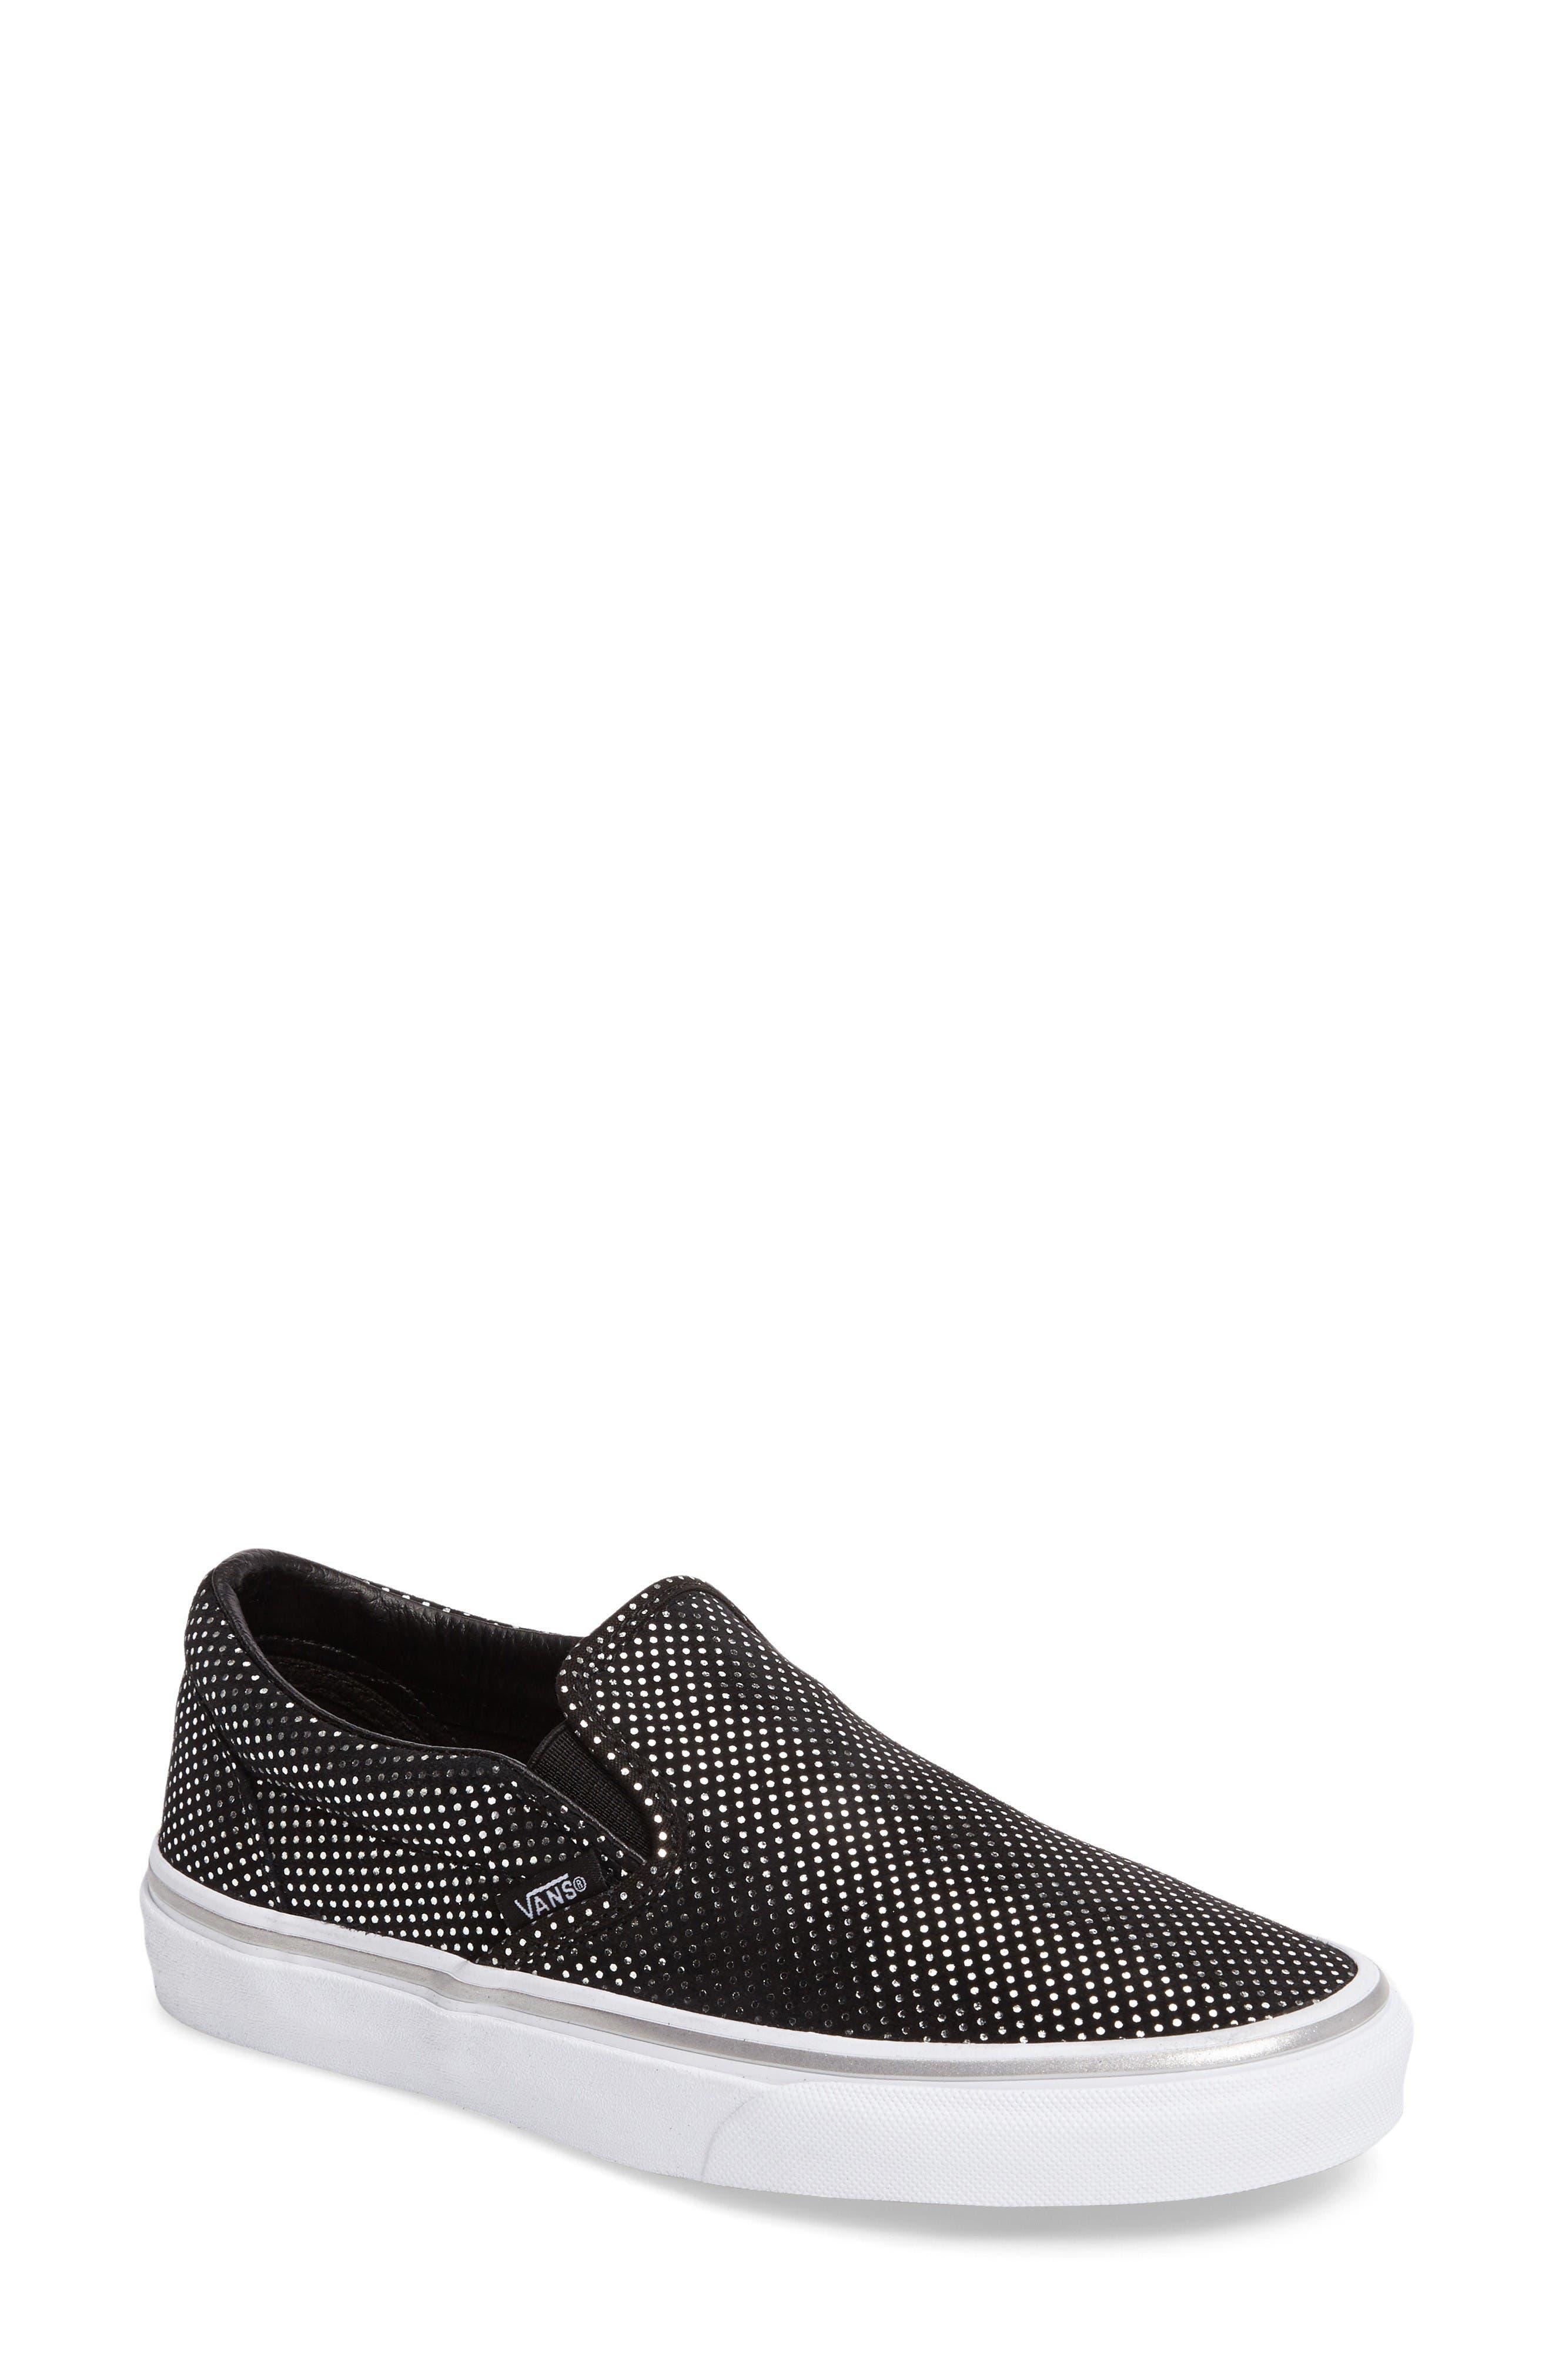 Classic Slip-On Sneaker,                         Main,                         color, Metallic Dots Silver/ Black